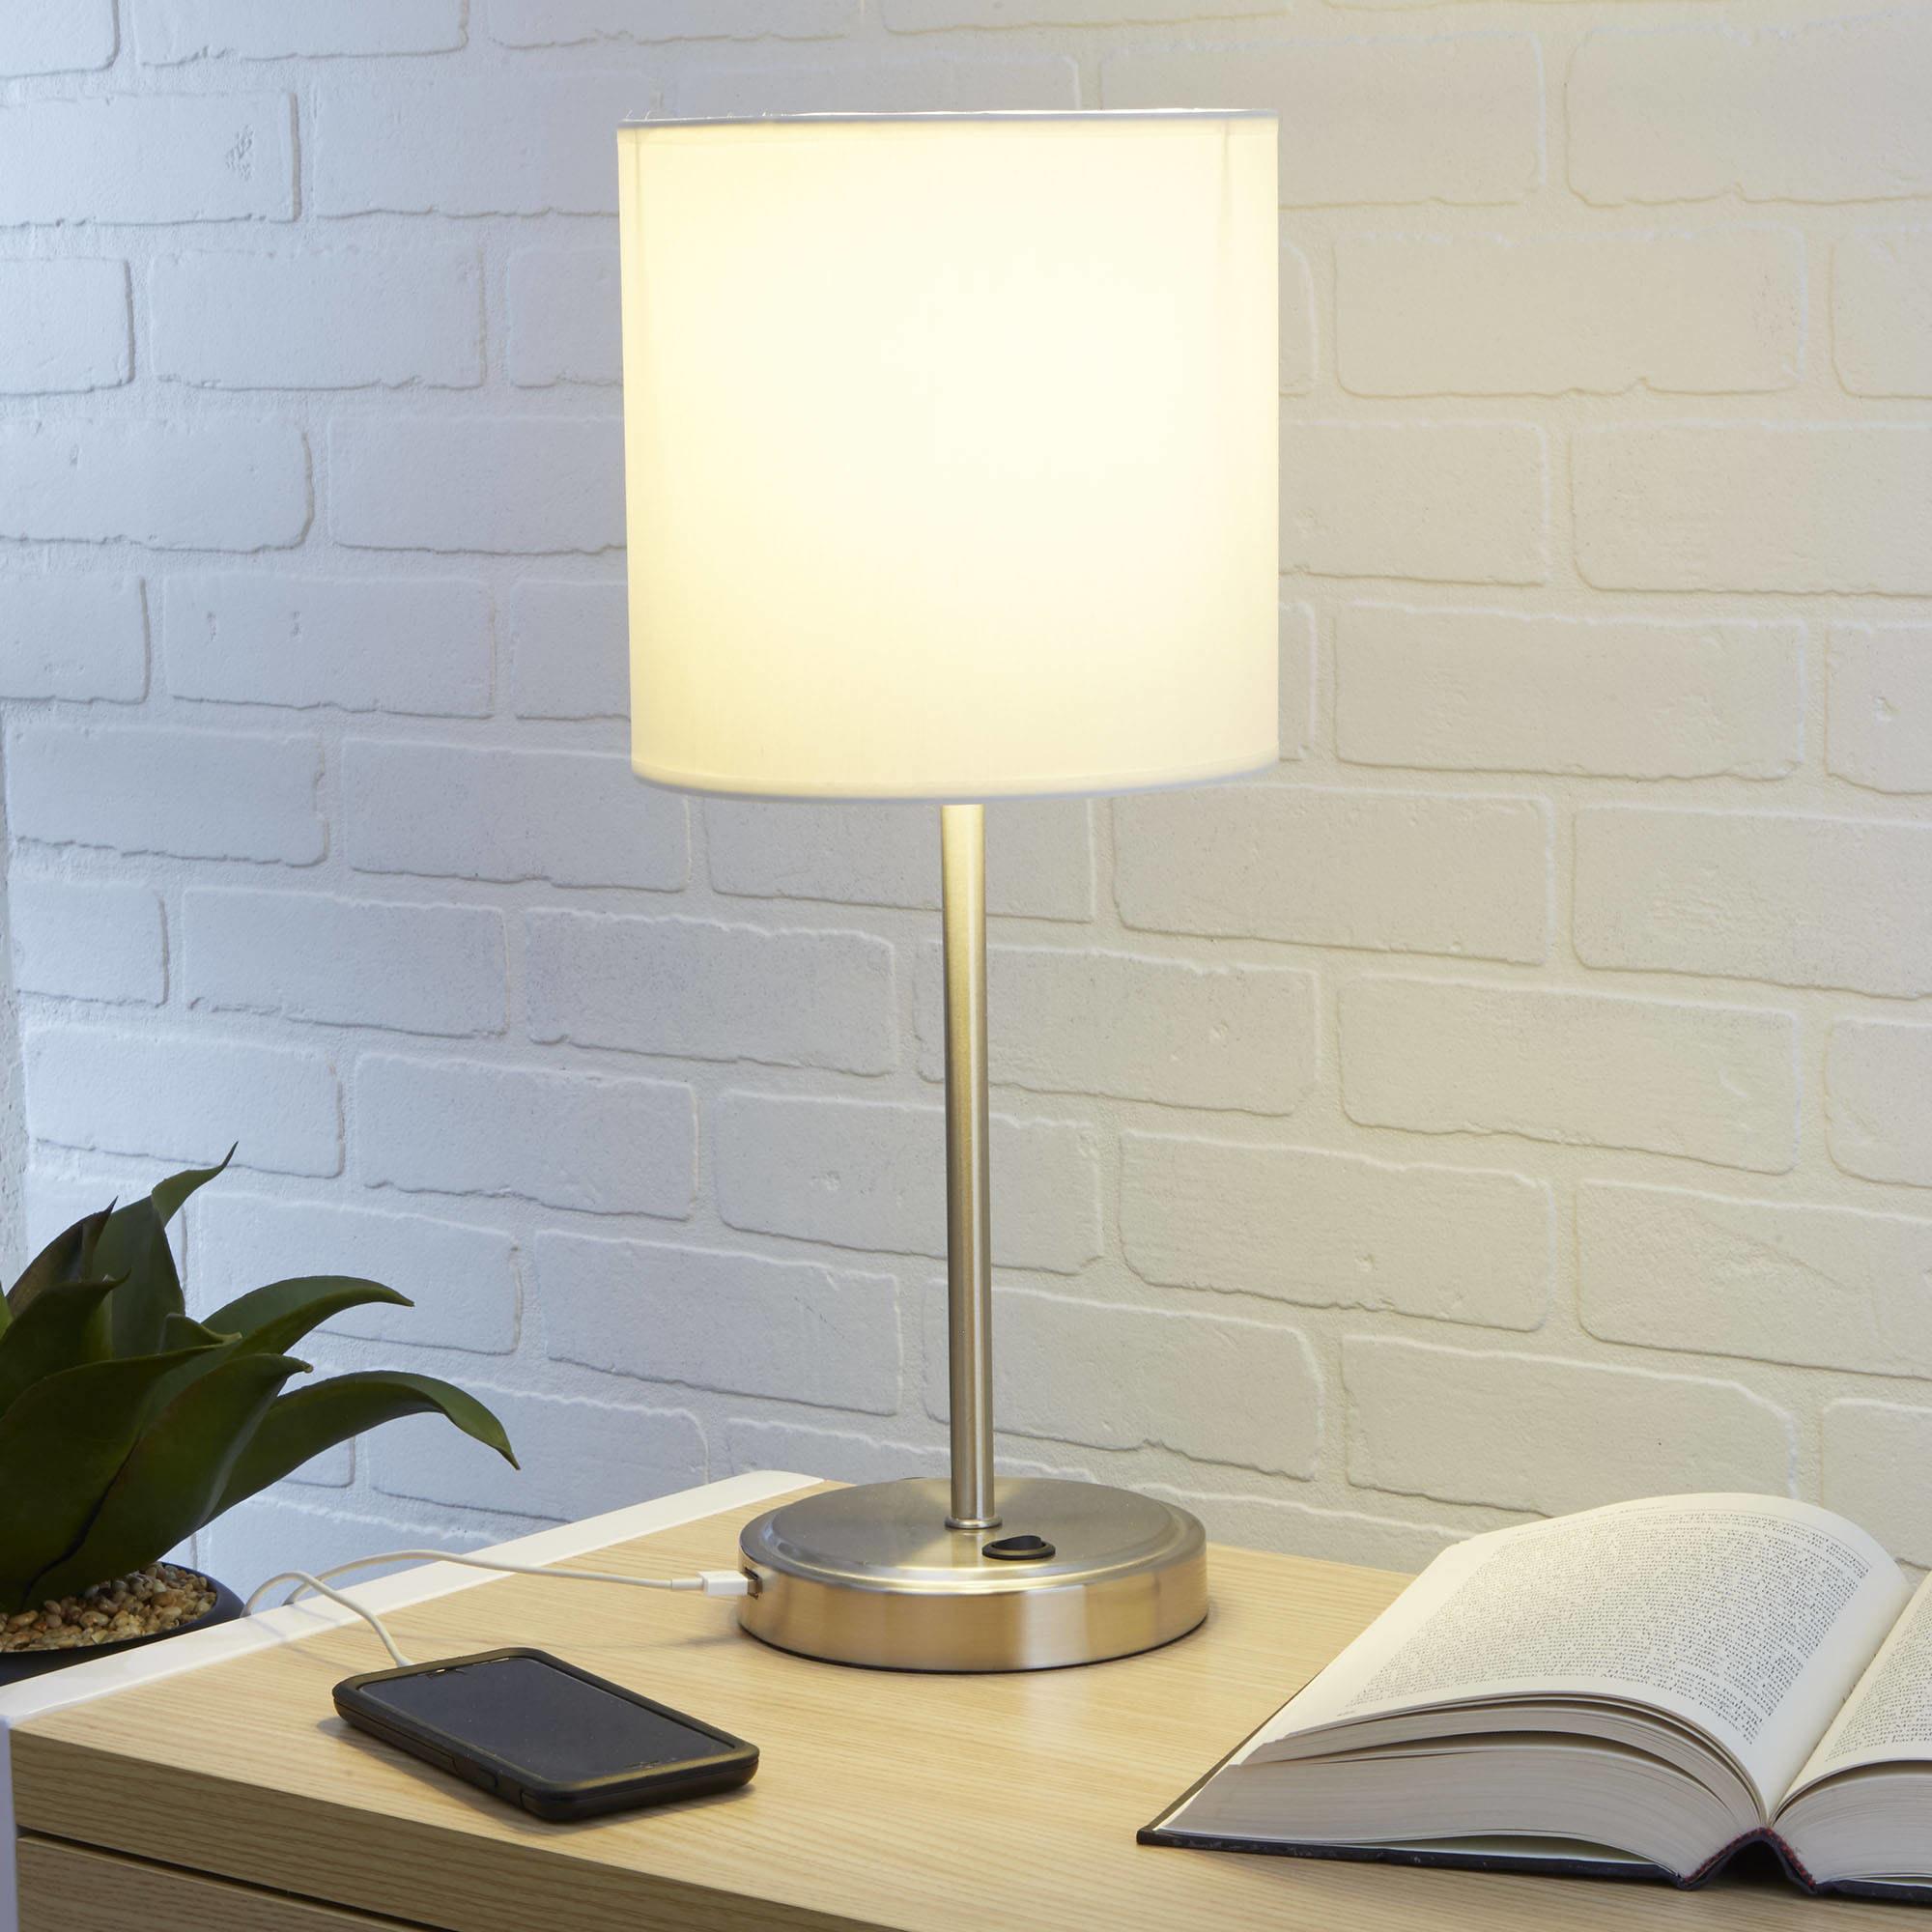 Thegrab and go stick lamp